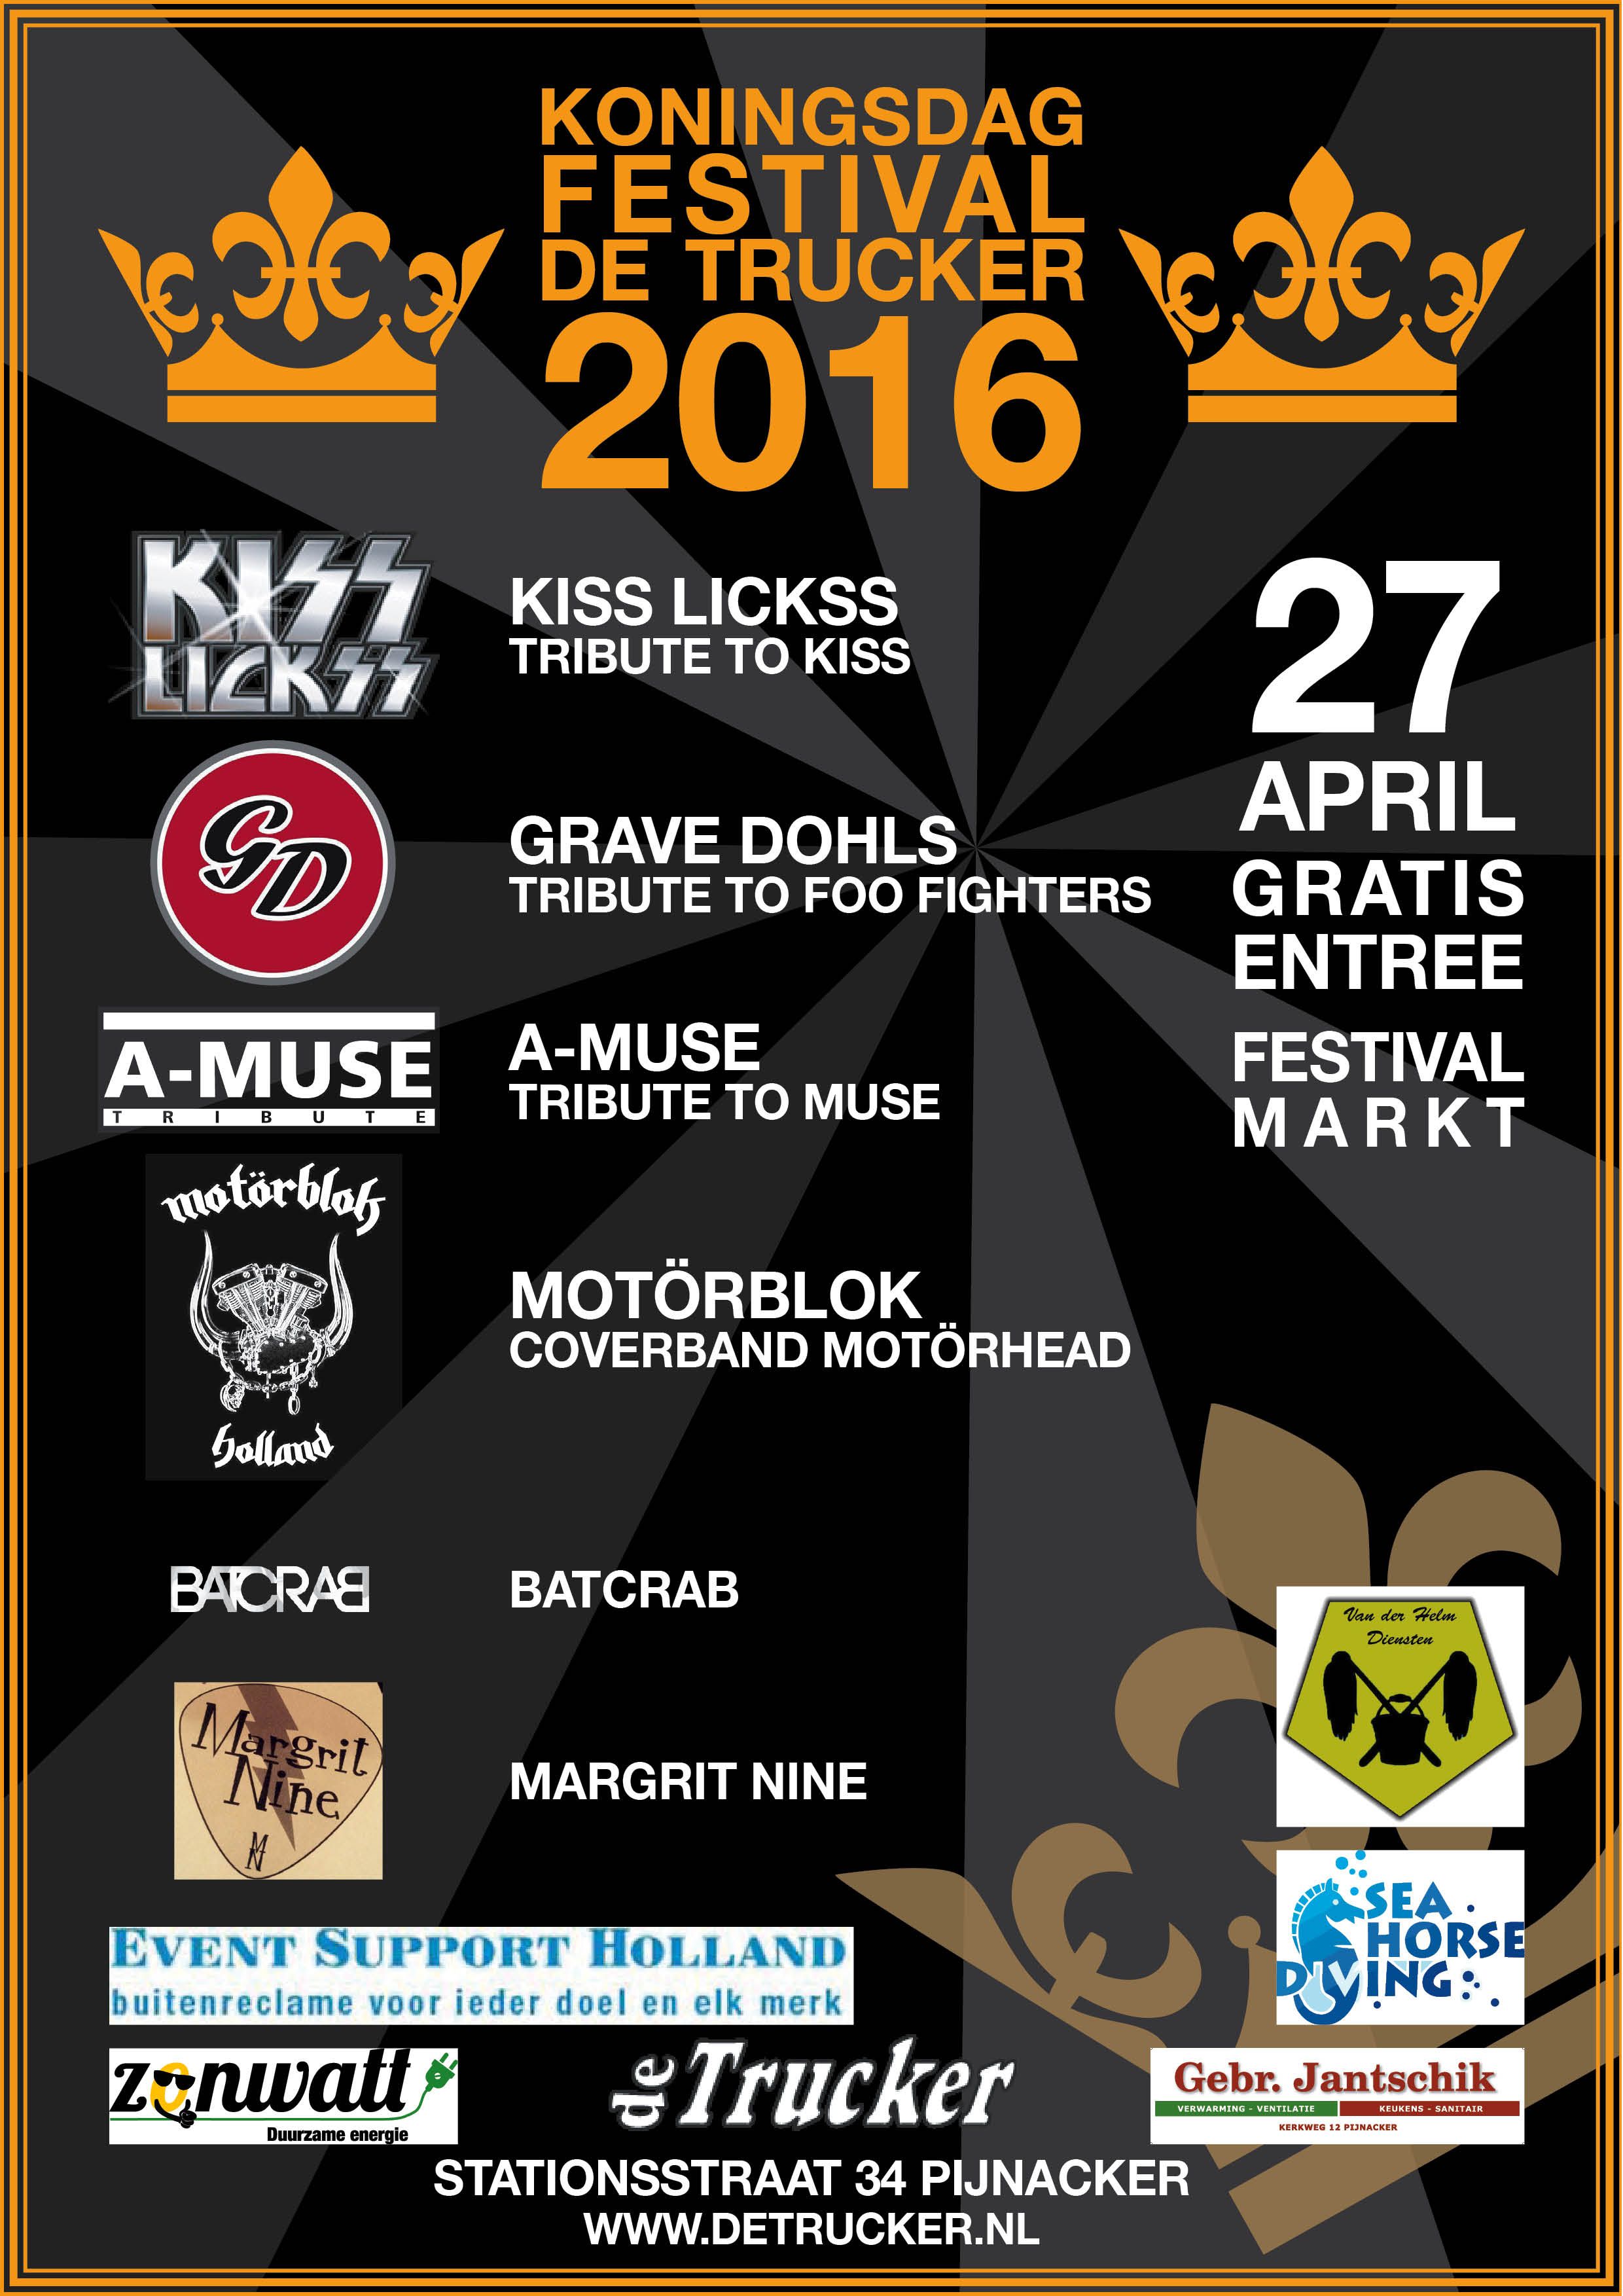 27 April Koningsdag 2016